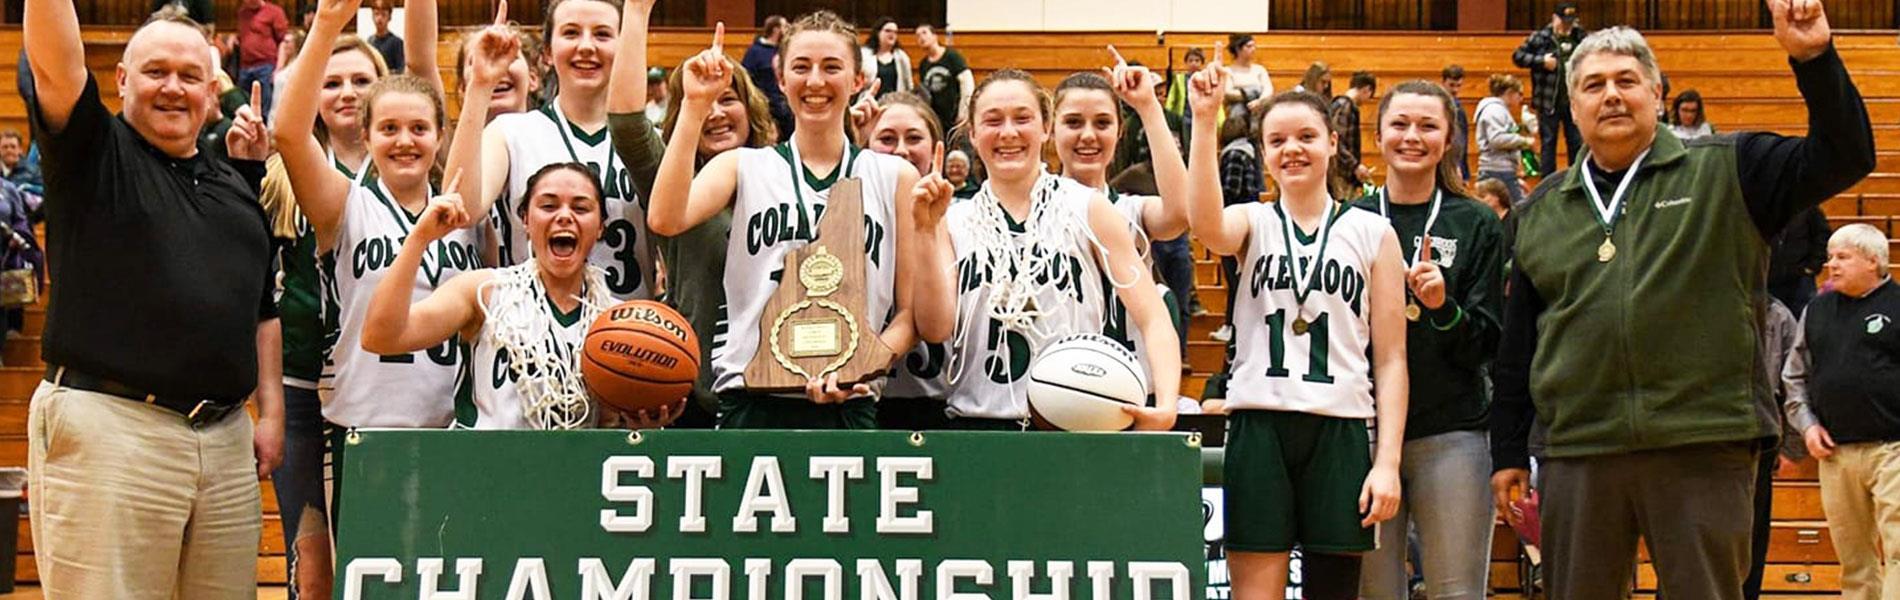 Colebrook girls basketball win state championship